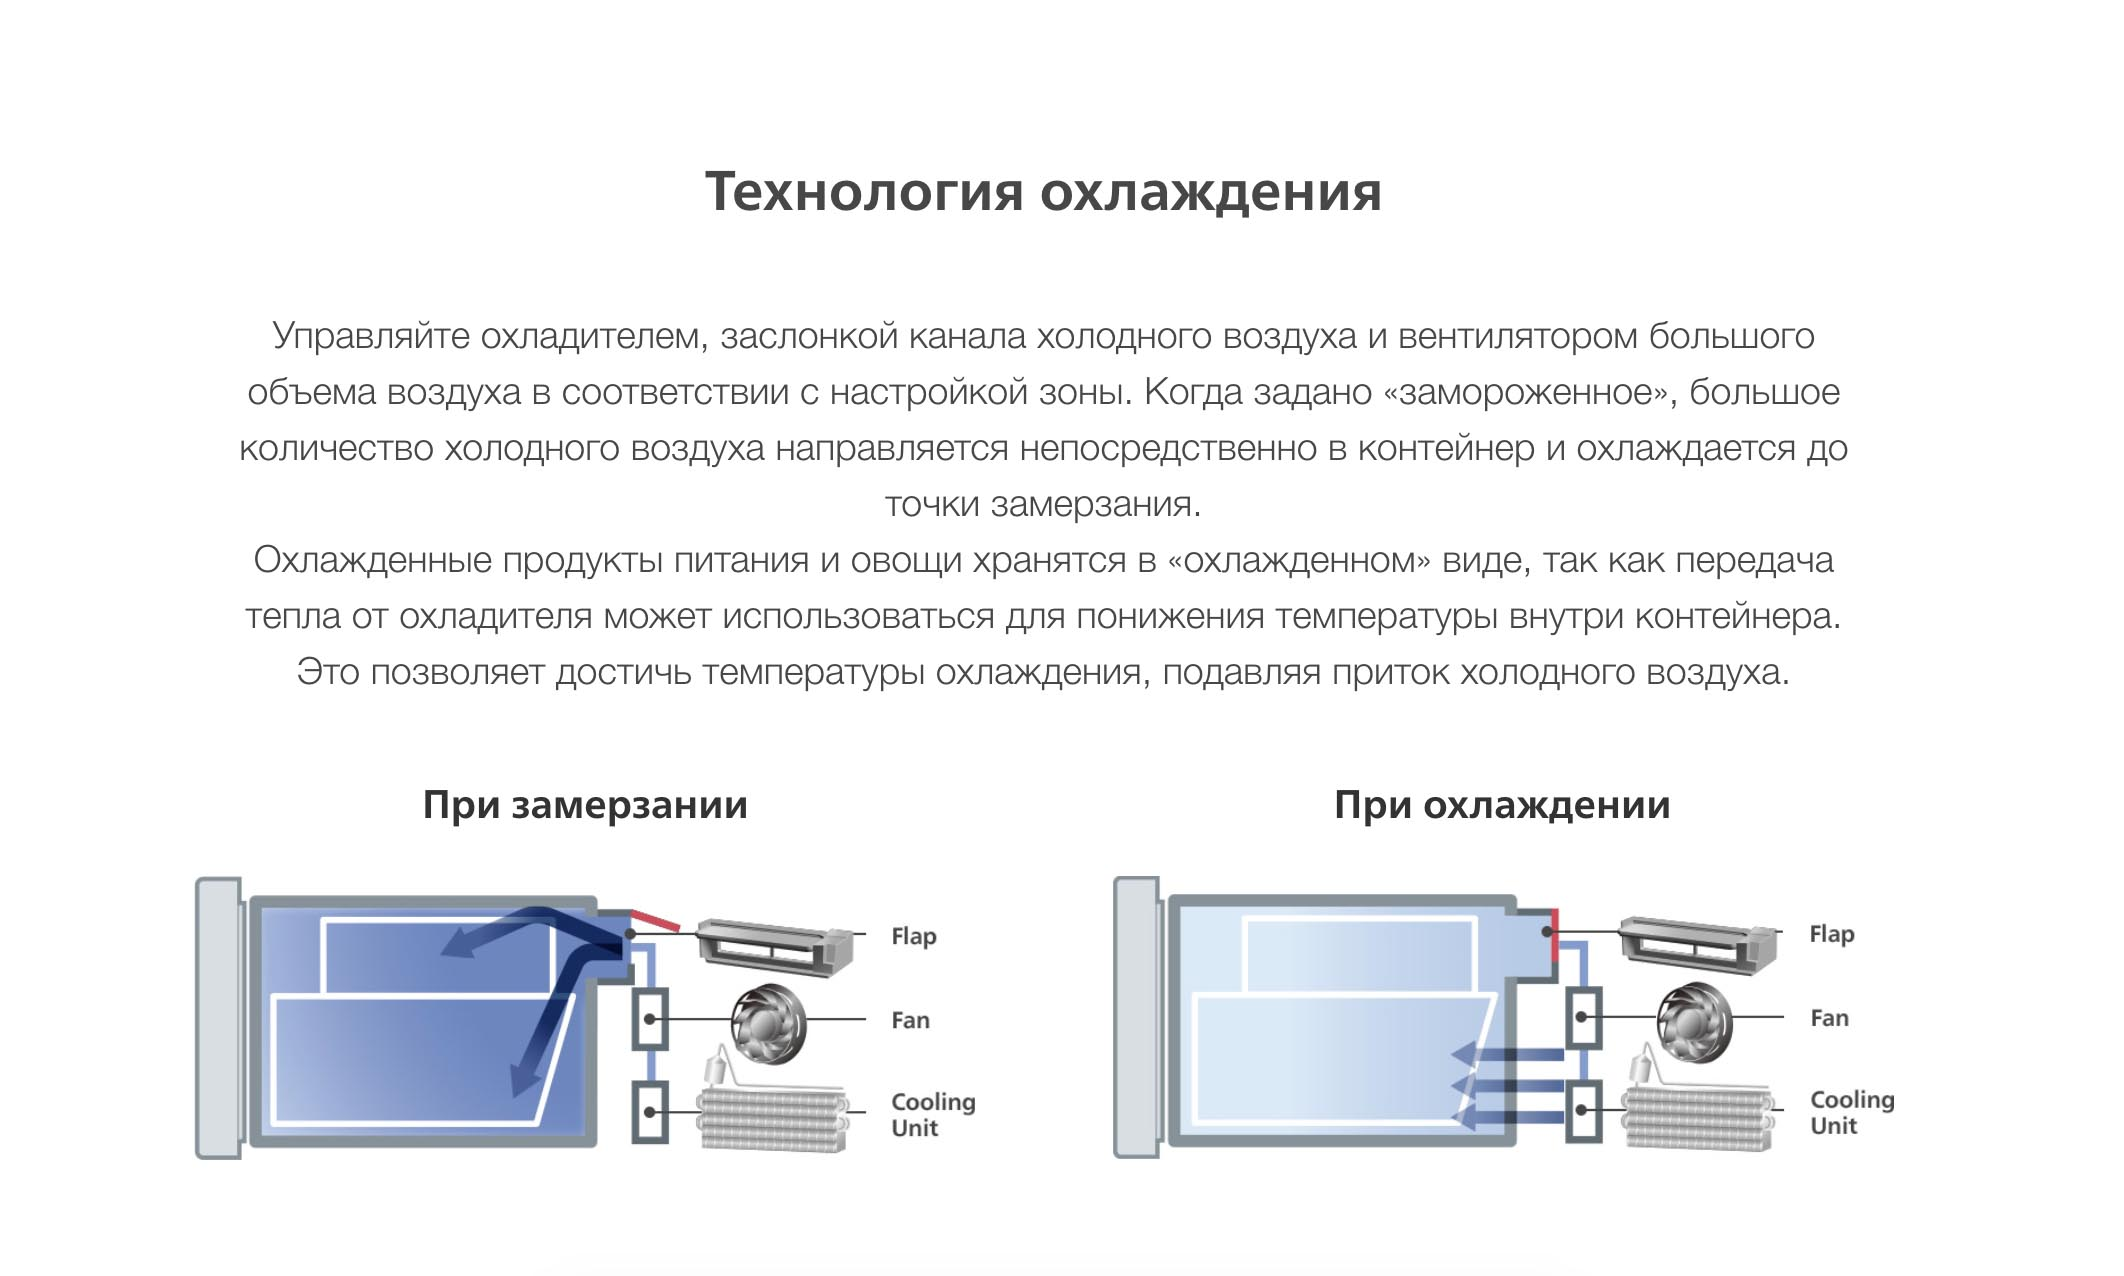 gibrid_zone3 Сравнение холодильников Hitachi R-WB640VUC0GBK и R-WB800PUC5GBK